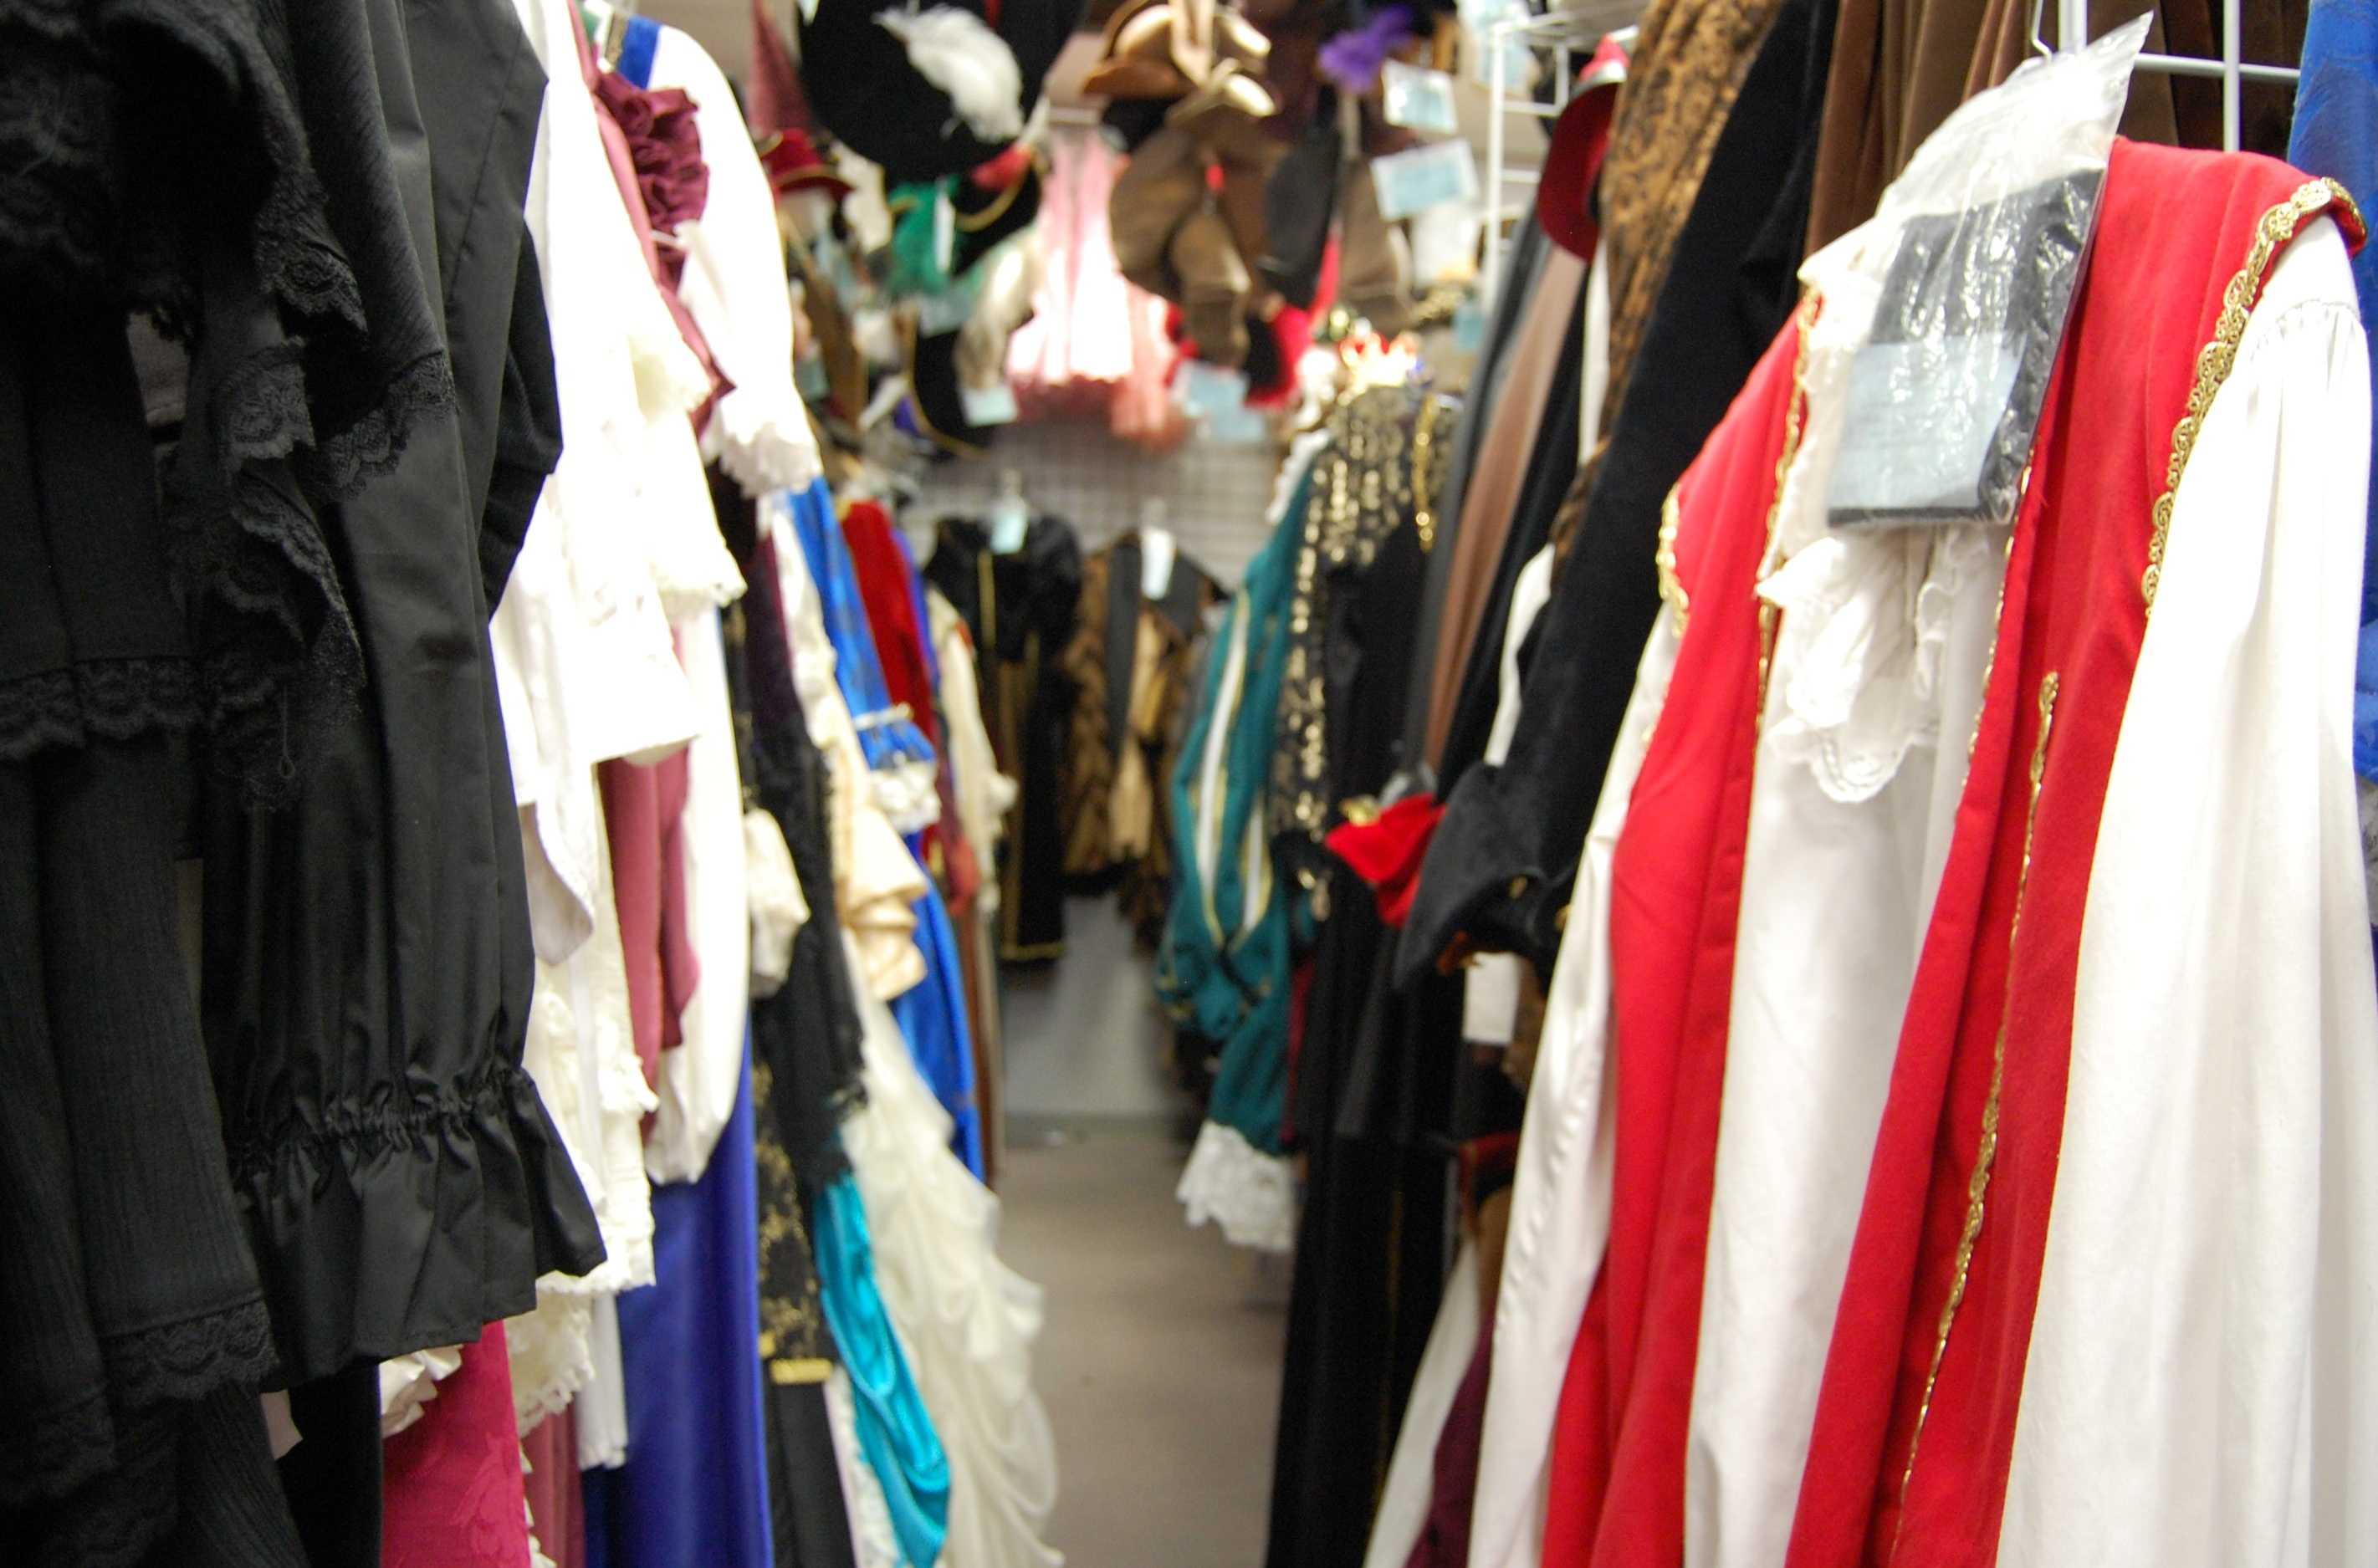 Inexpensive Halloween costume stores | The Sundial